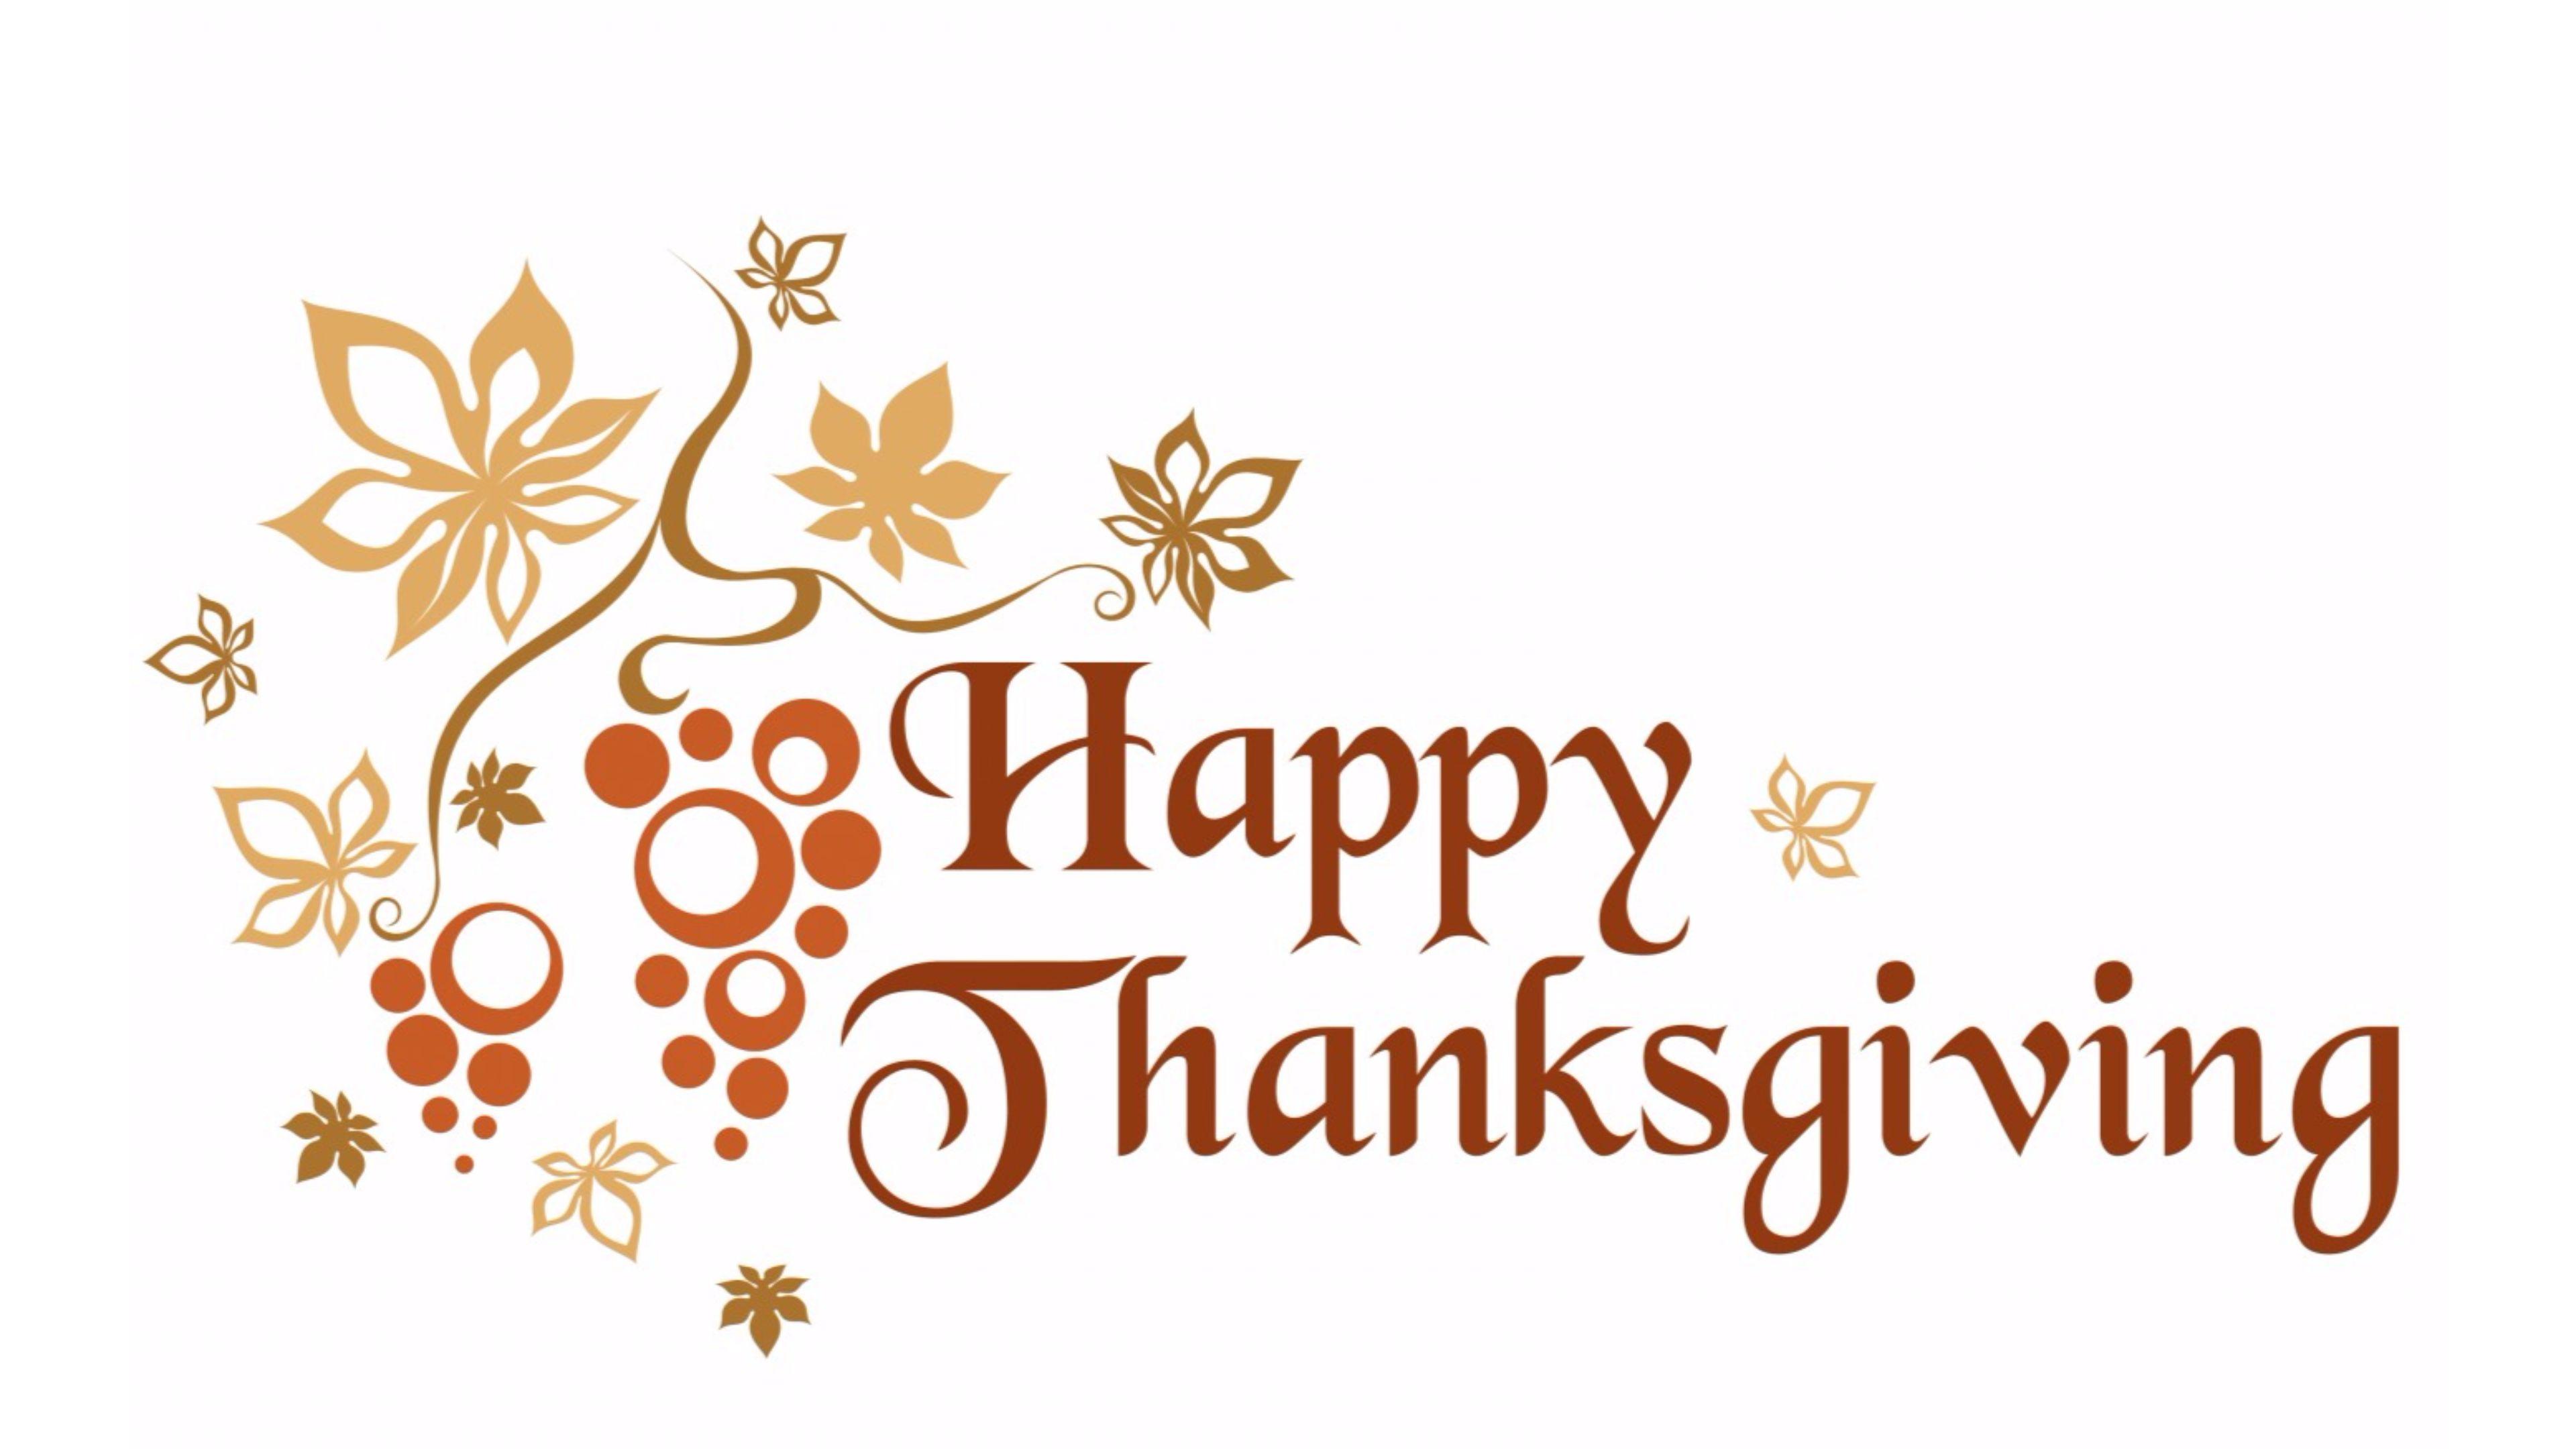 Admirable Quotes Happy Thanksgiving Kachemak Group Real E Happy Thanksgiving Pics Ny Happy Thanksgiving Pics inspiration Happy Thanksgiving Pics